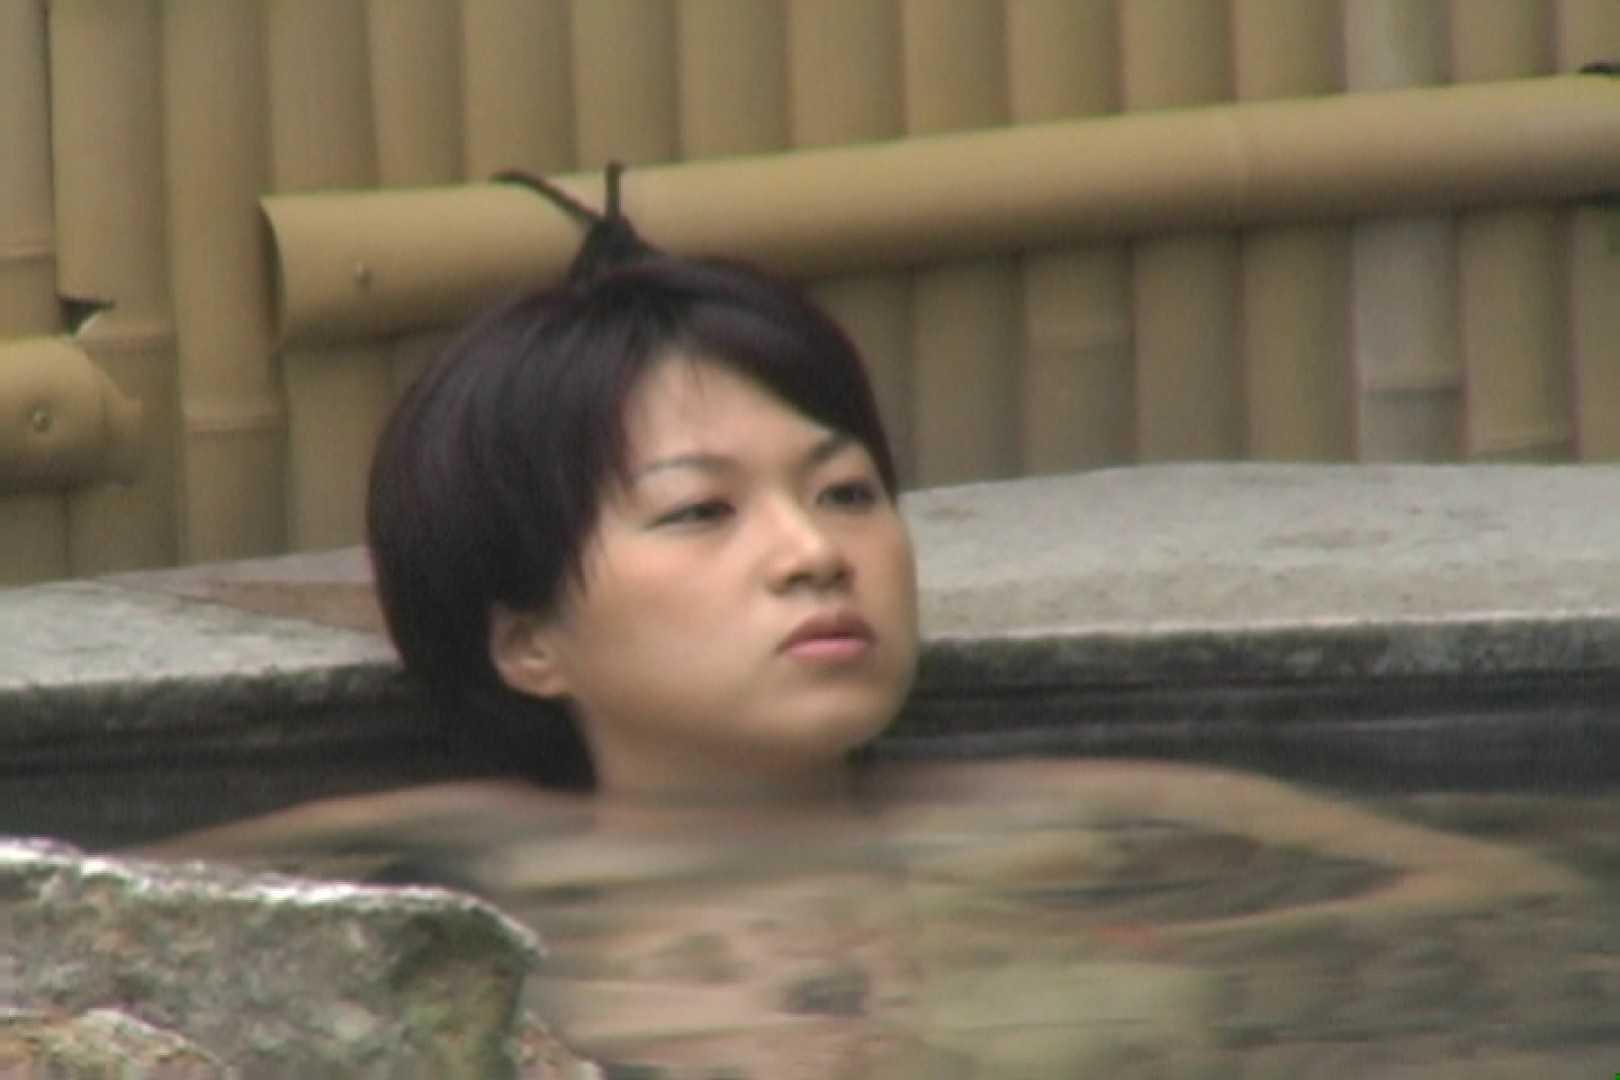 Aquaな露天風呂Vol.624 露天   OLセックス  52画像 25